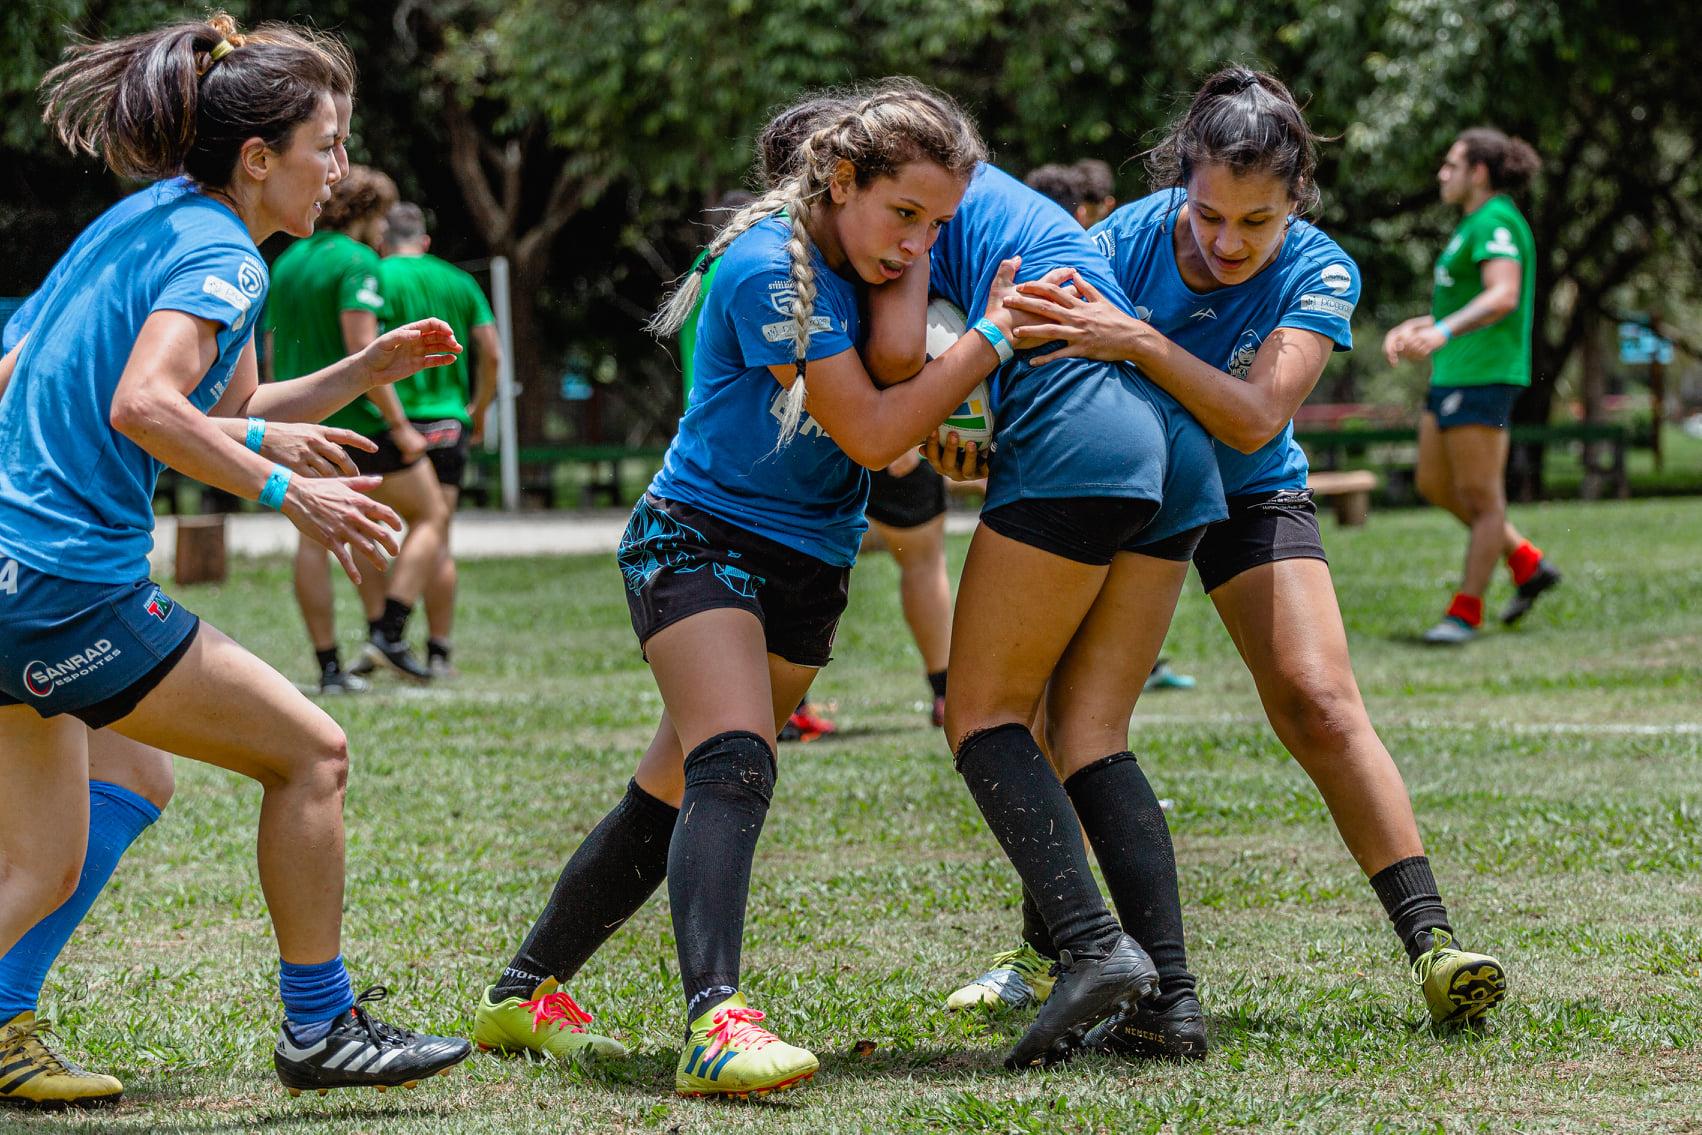 Record numbers to take part in 2021 Brasil Women's Premiership